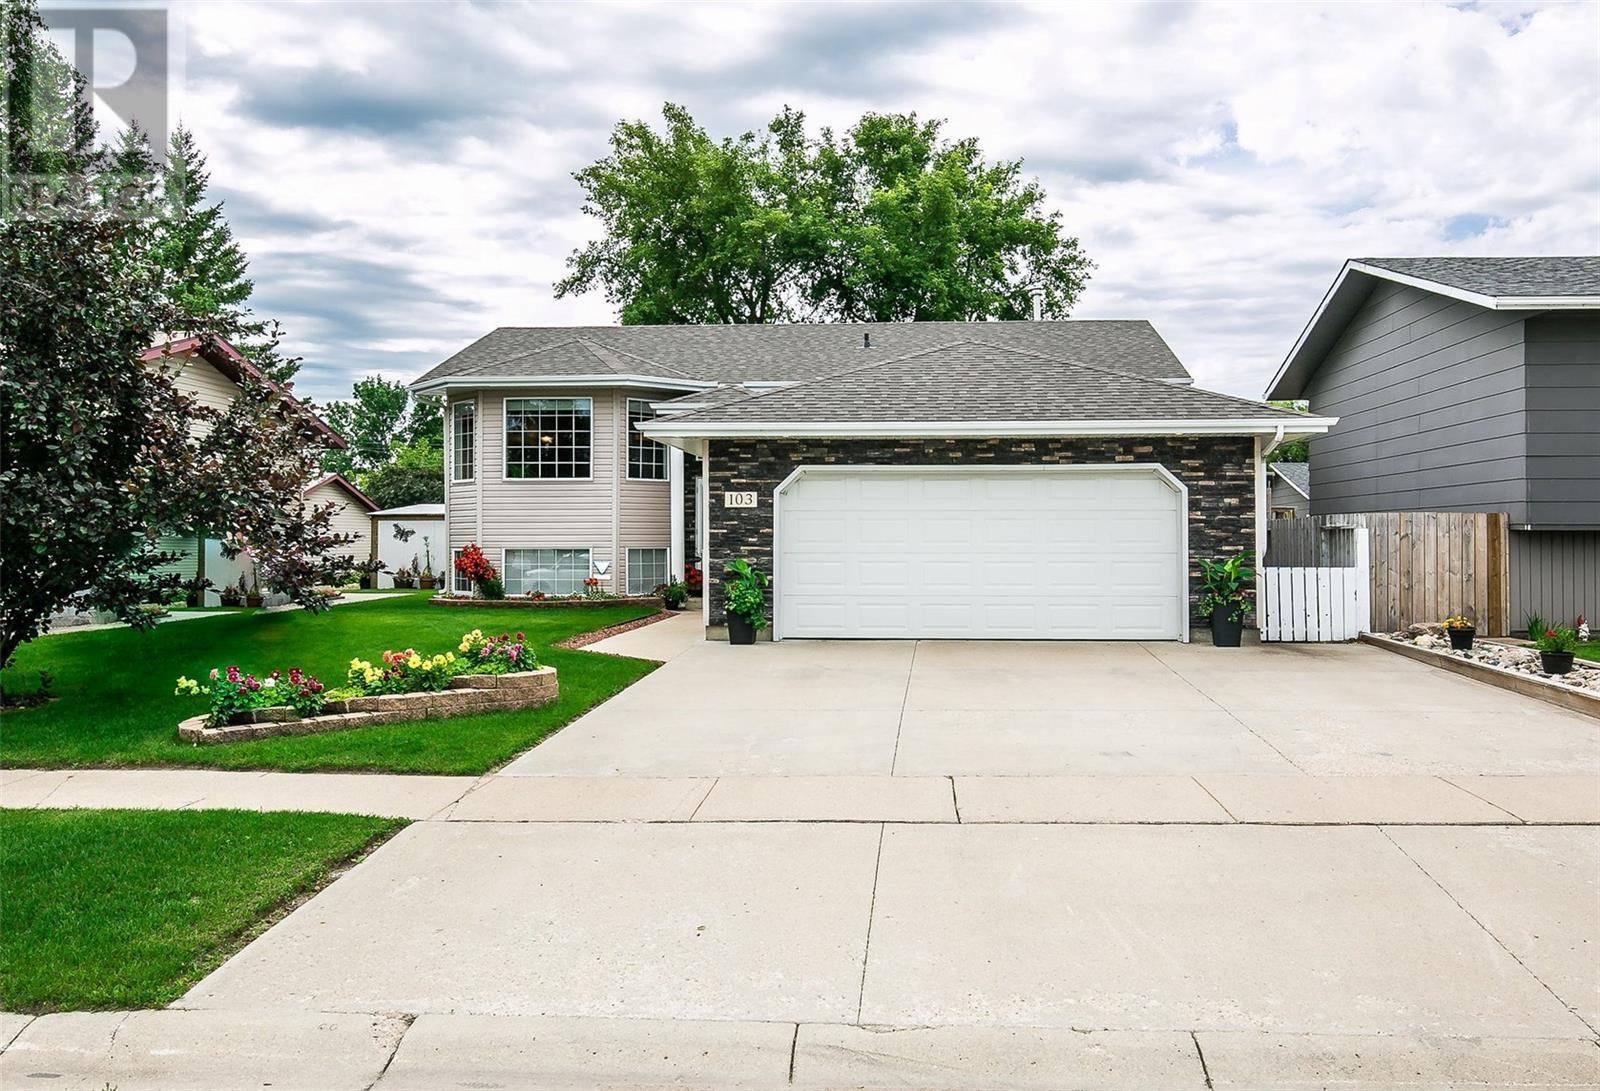 House for sale at 103 Canora St W Warman Saskatchewan - MLS: SK782792